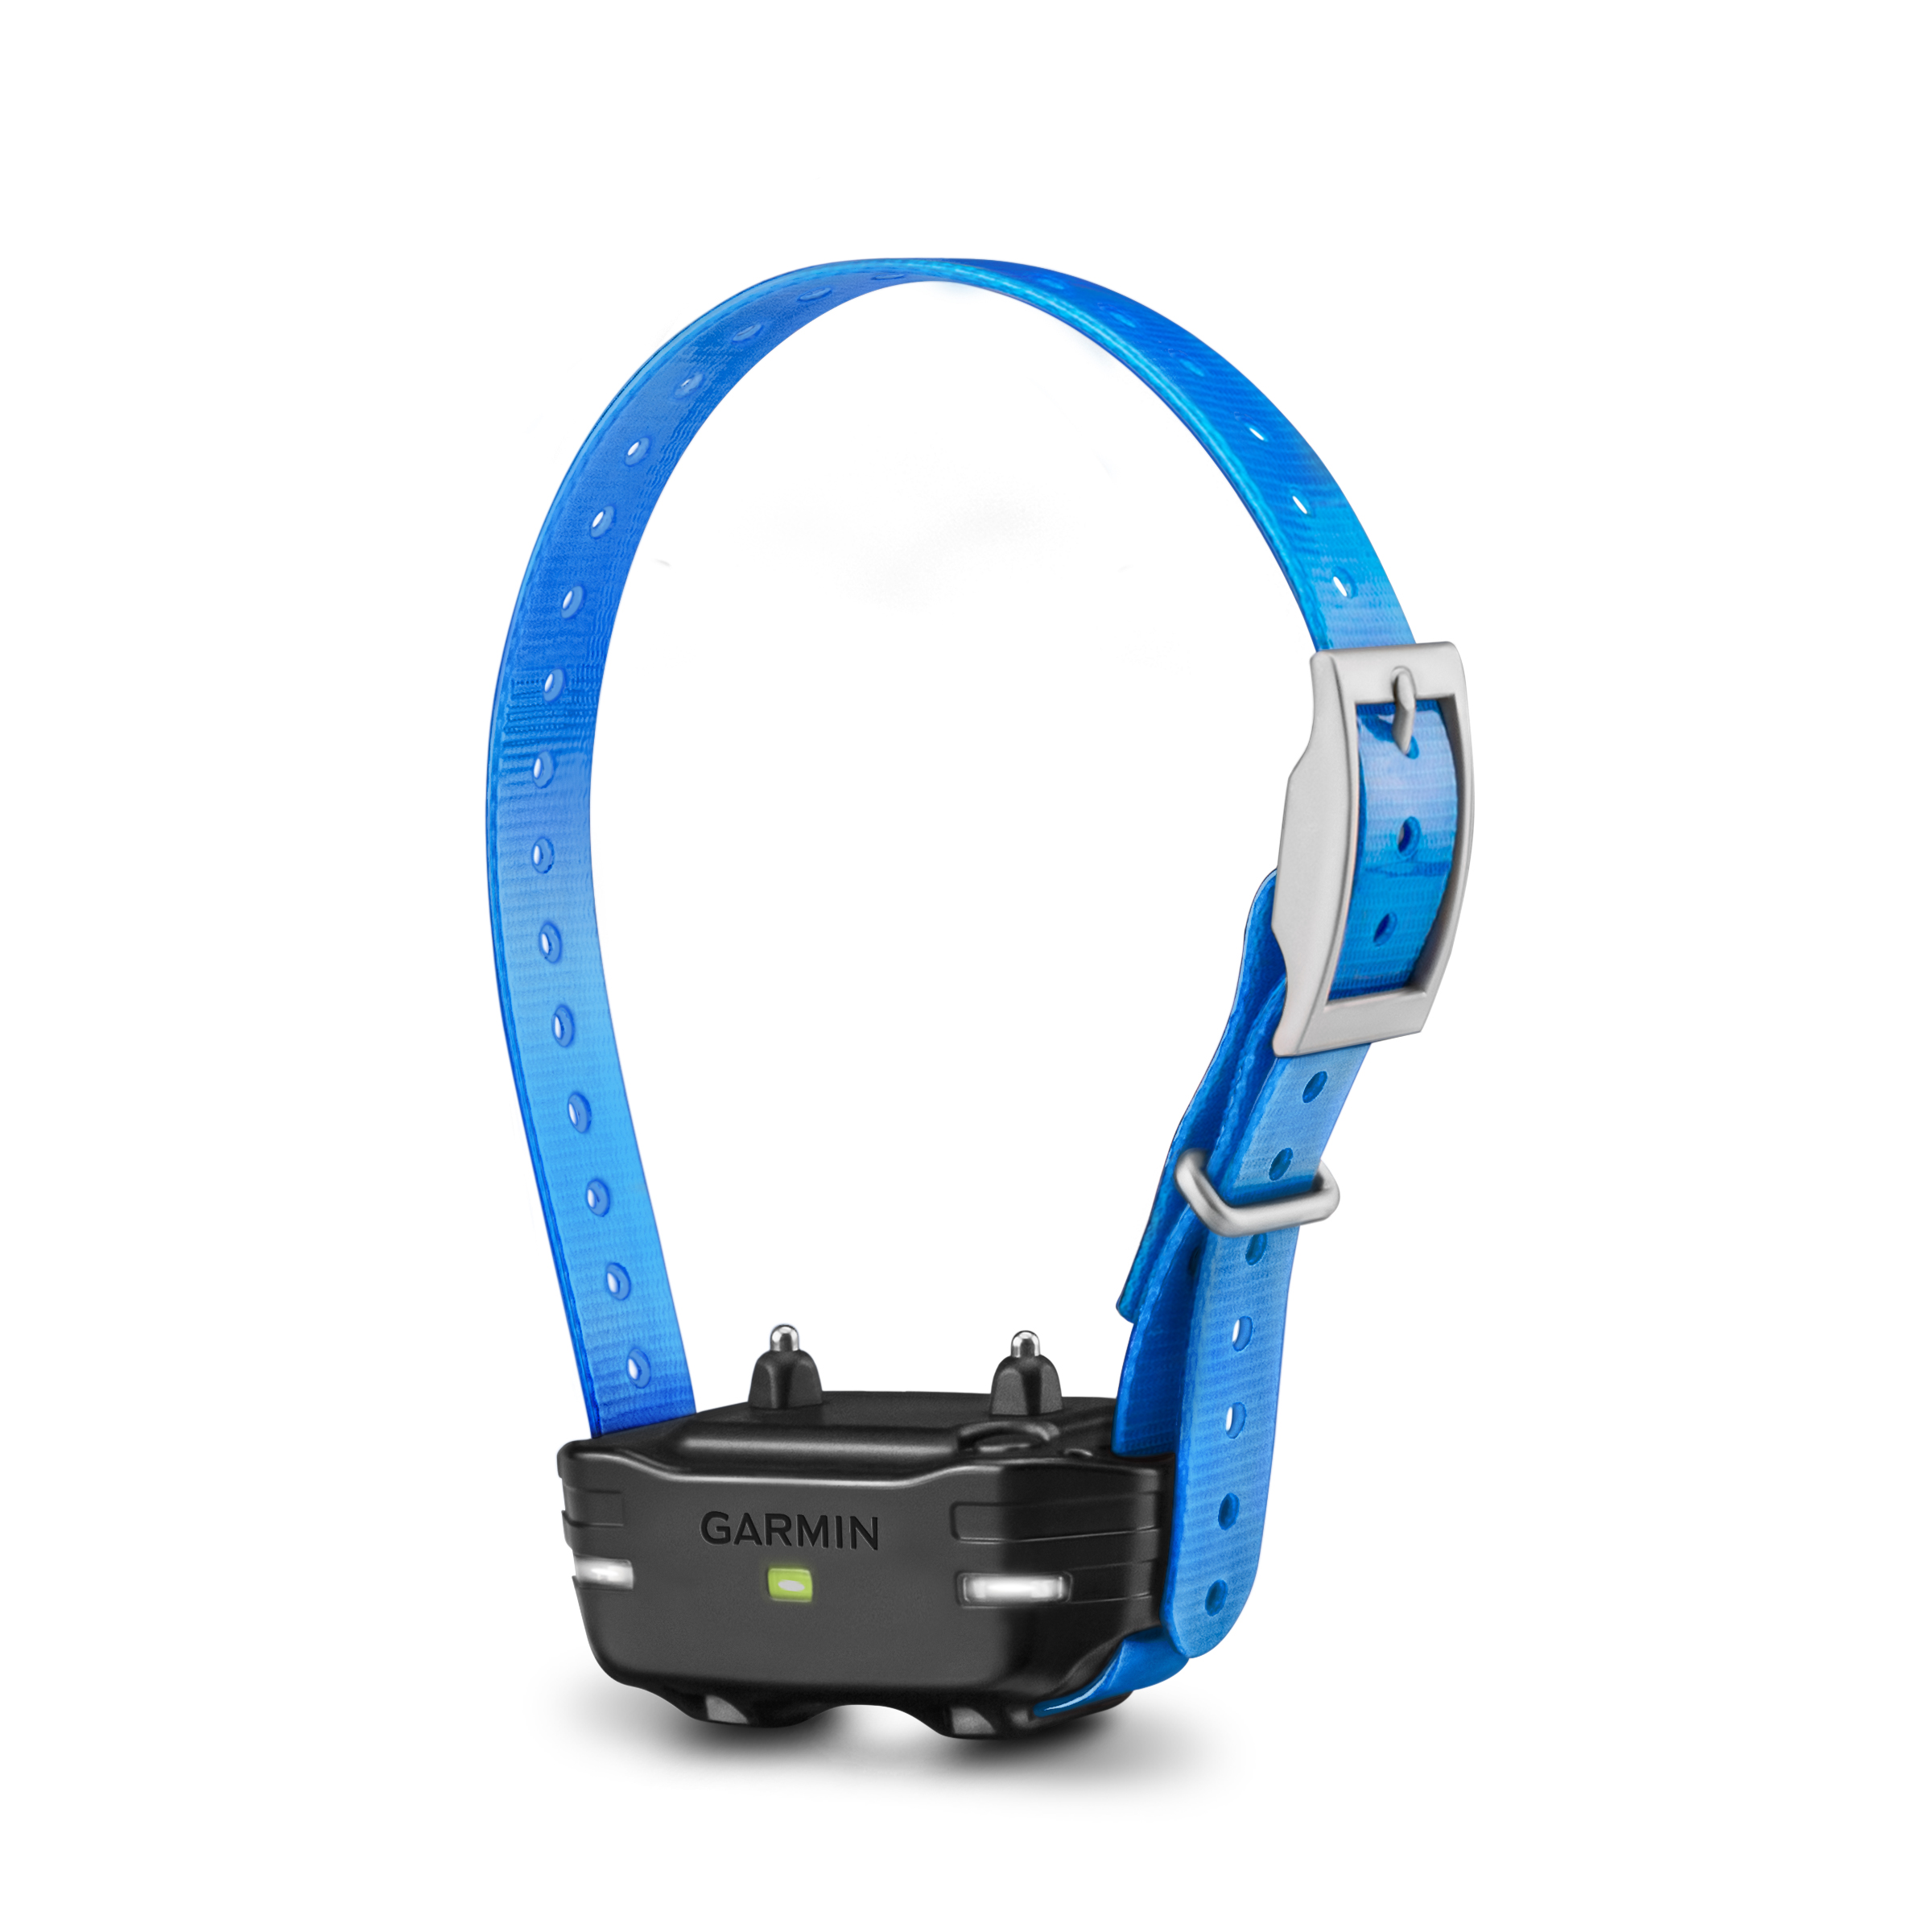 Garmin PT-10 Collar